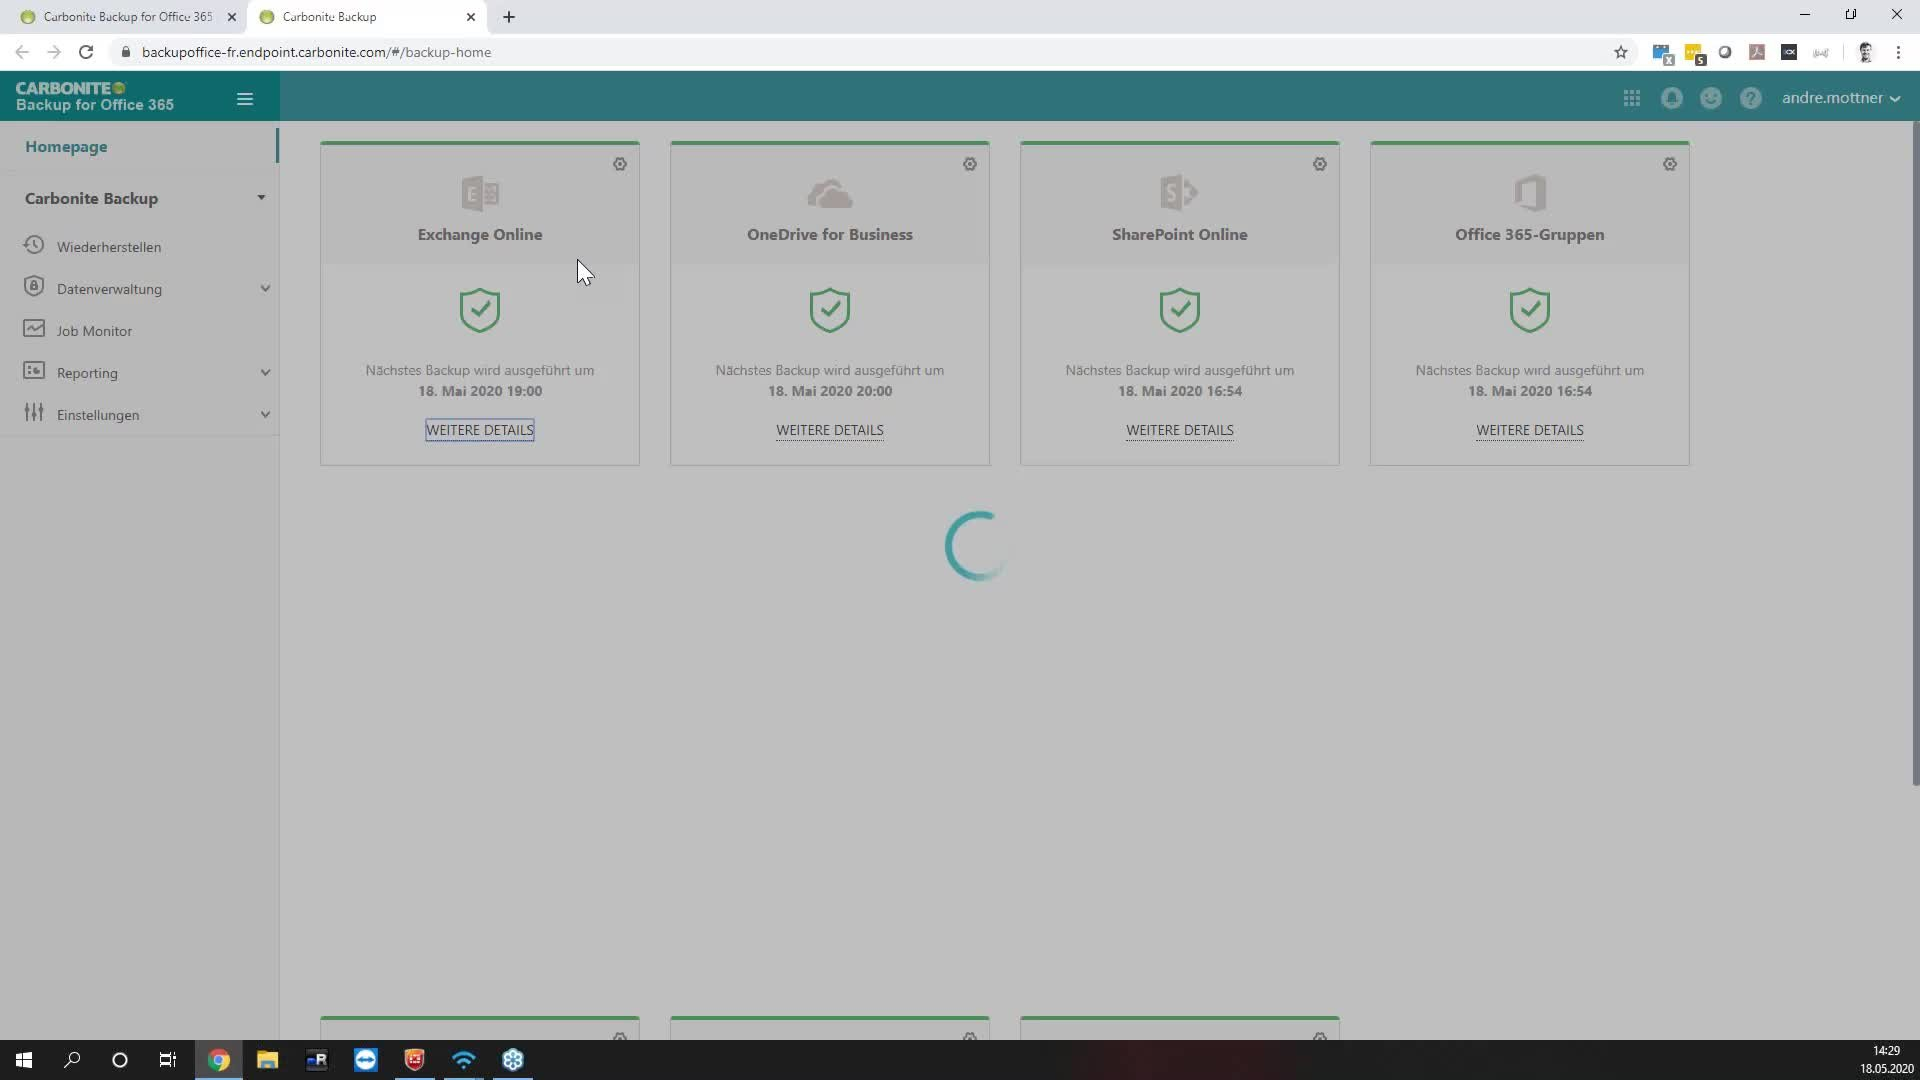 EBERTLANG Webinar 18.05.2020 mit CRN